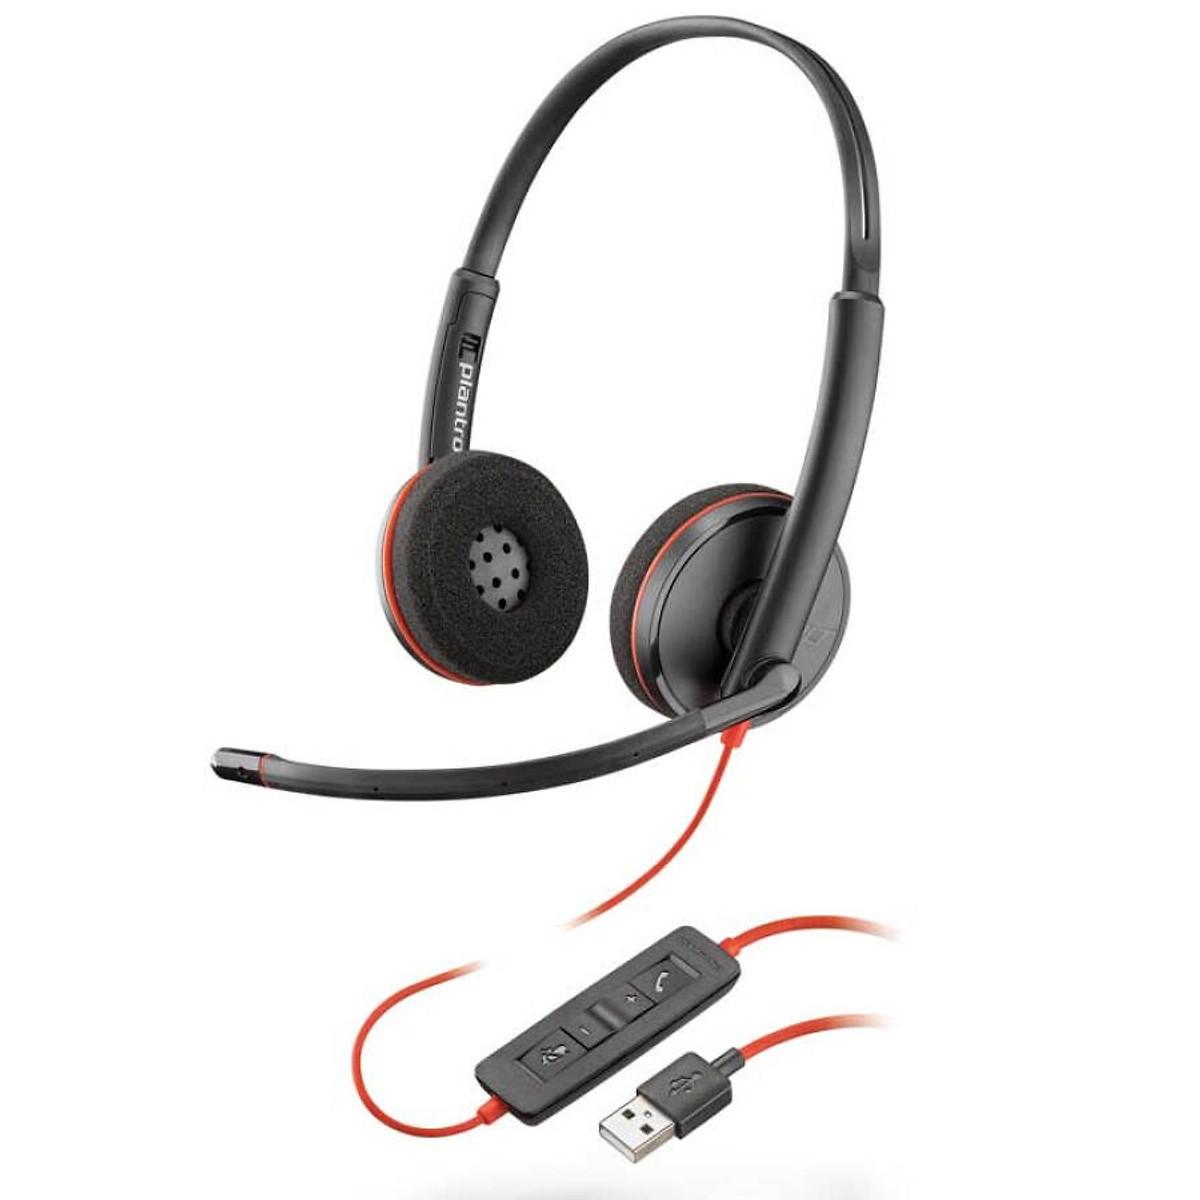 Tai nghe Plantronic C3220 Stereo (chuẩn USB, 2 tai)